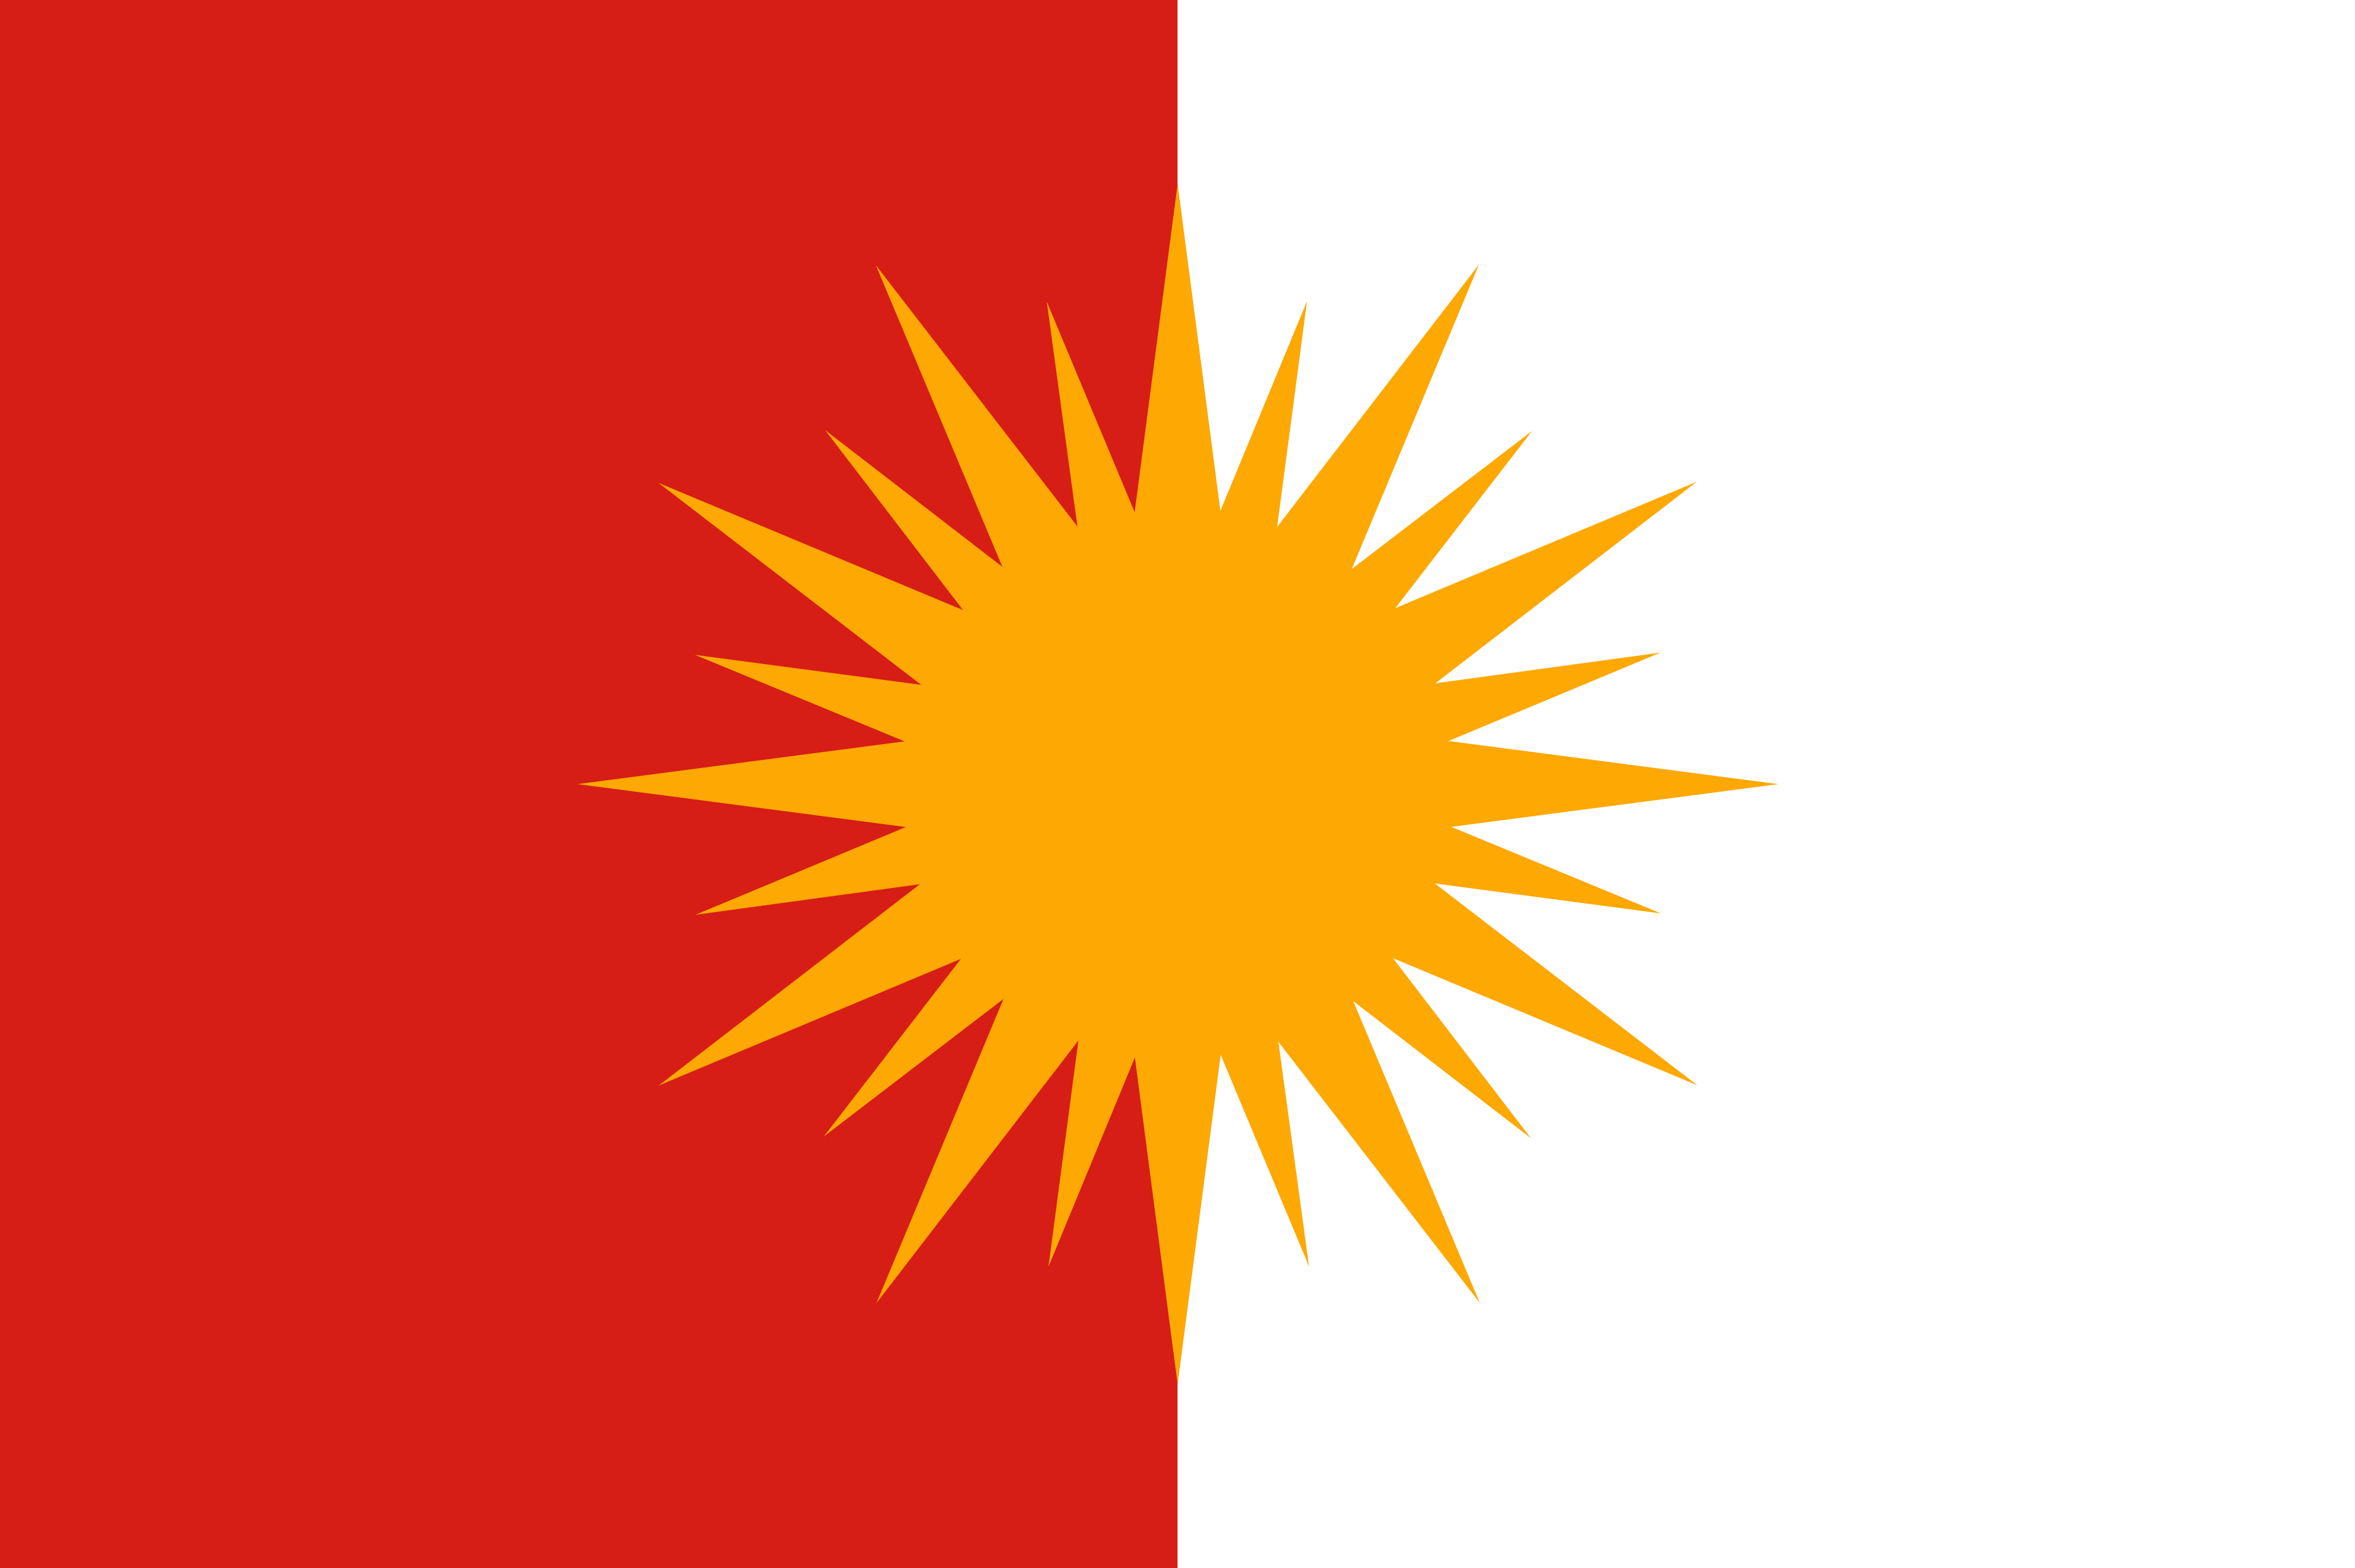 https://upload.wikimedia.org/wikipedia/commons/1/1e/Yezidi_Flag.jpg